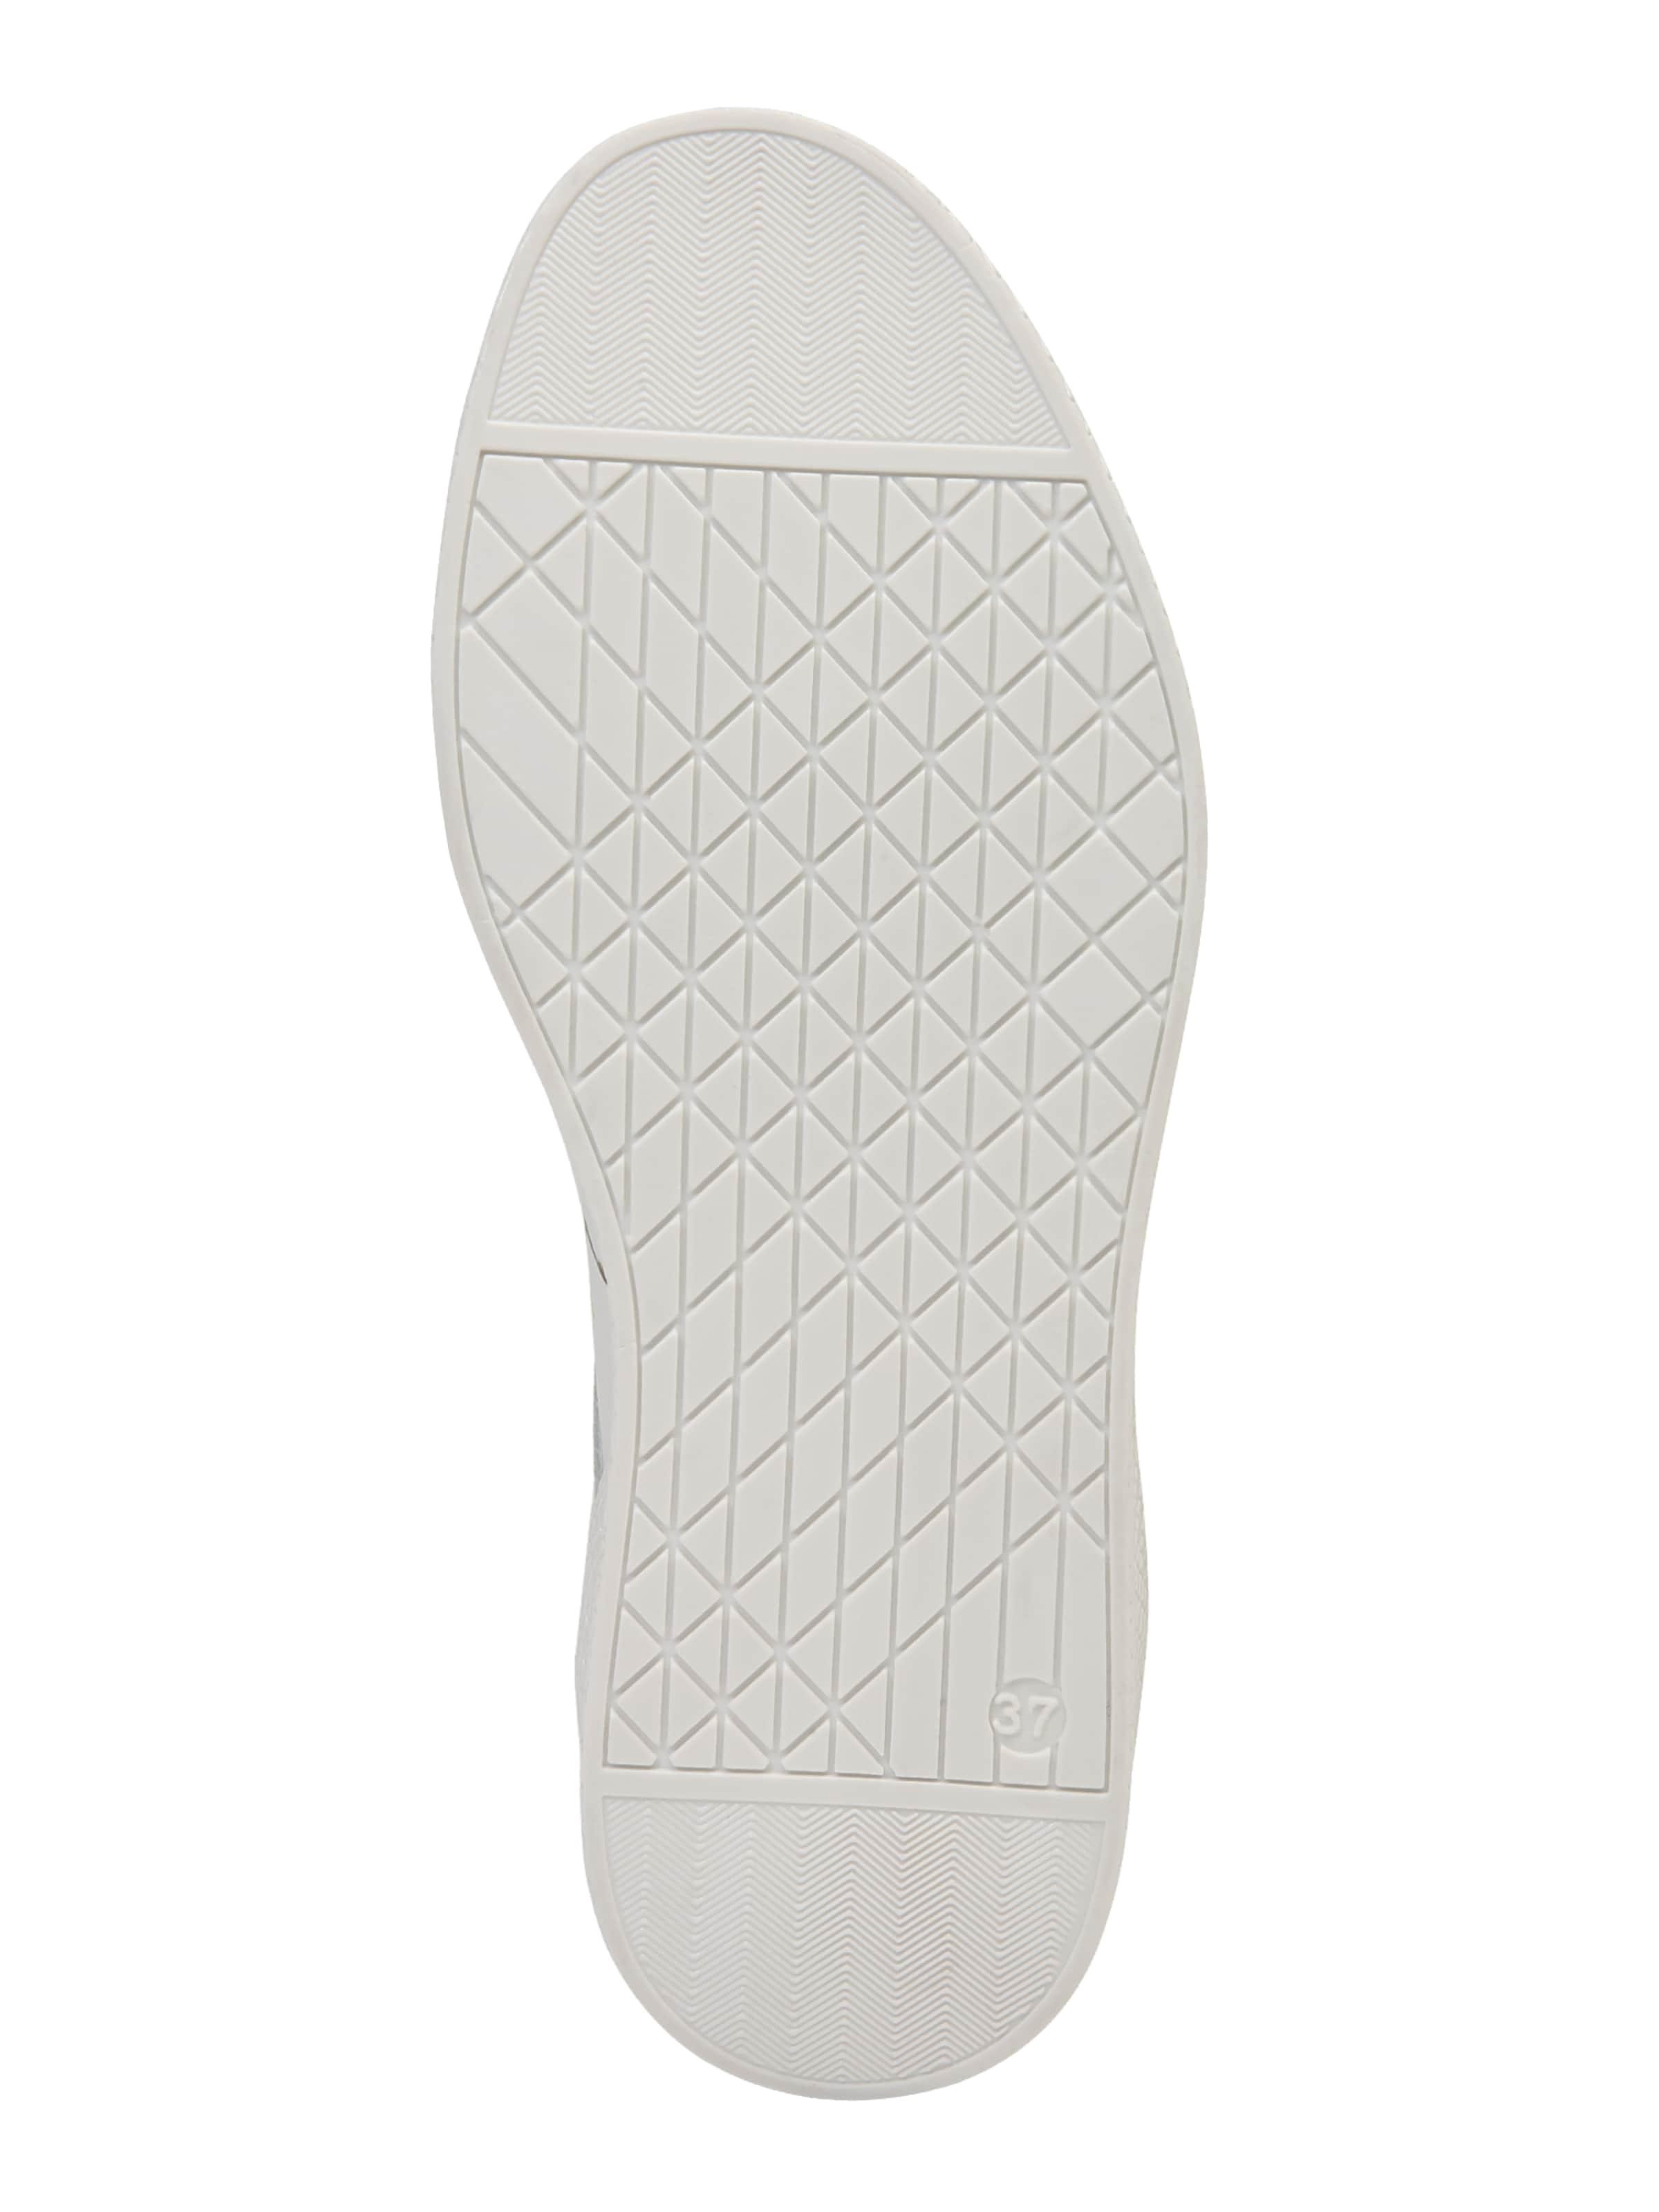 Marktfähig Zu Verkaufen SPM 'Soho' Sneaker Sneakers Low Outlet Rabatt Authentisch Rabatt Besuch Neu Billig ZRwQ8NvFC